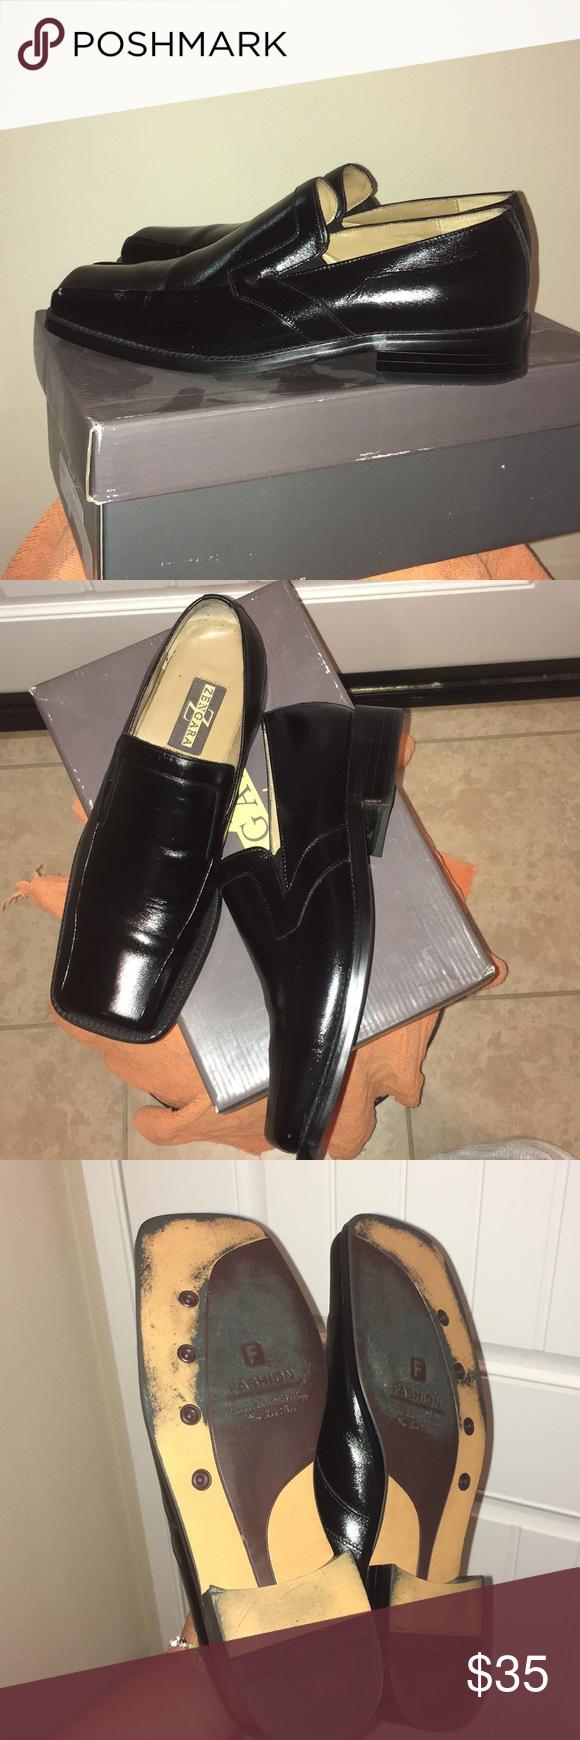 hard bottom dress shoes